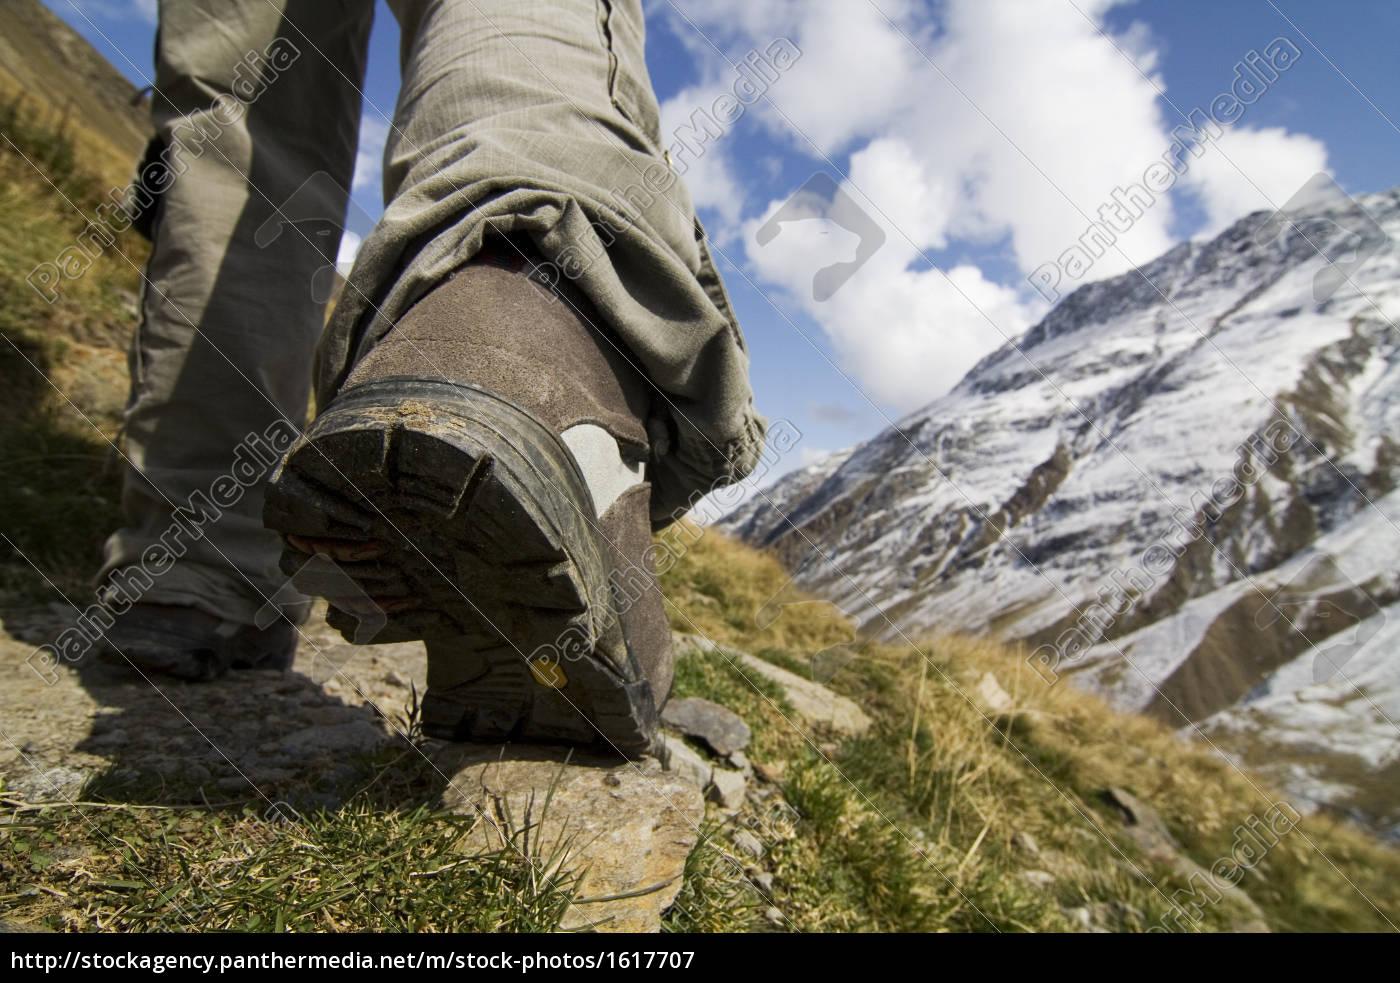 hiking, boot - 1617707